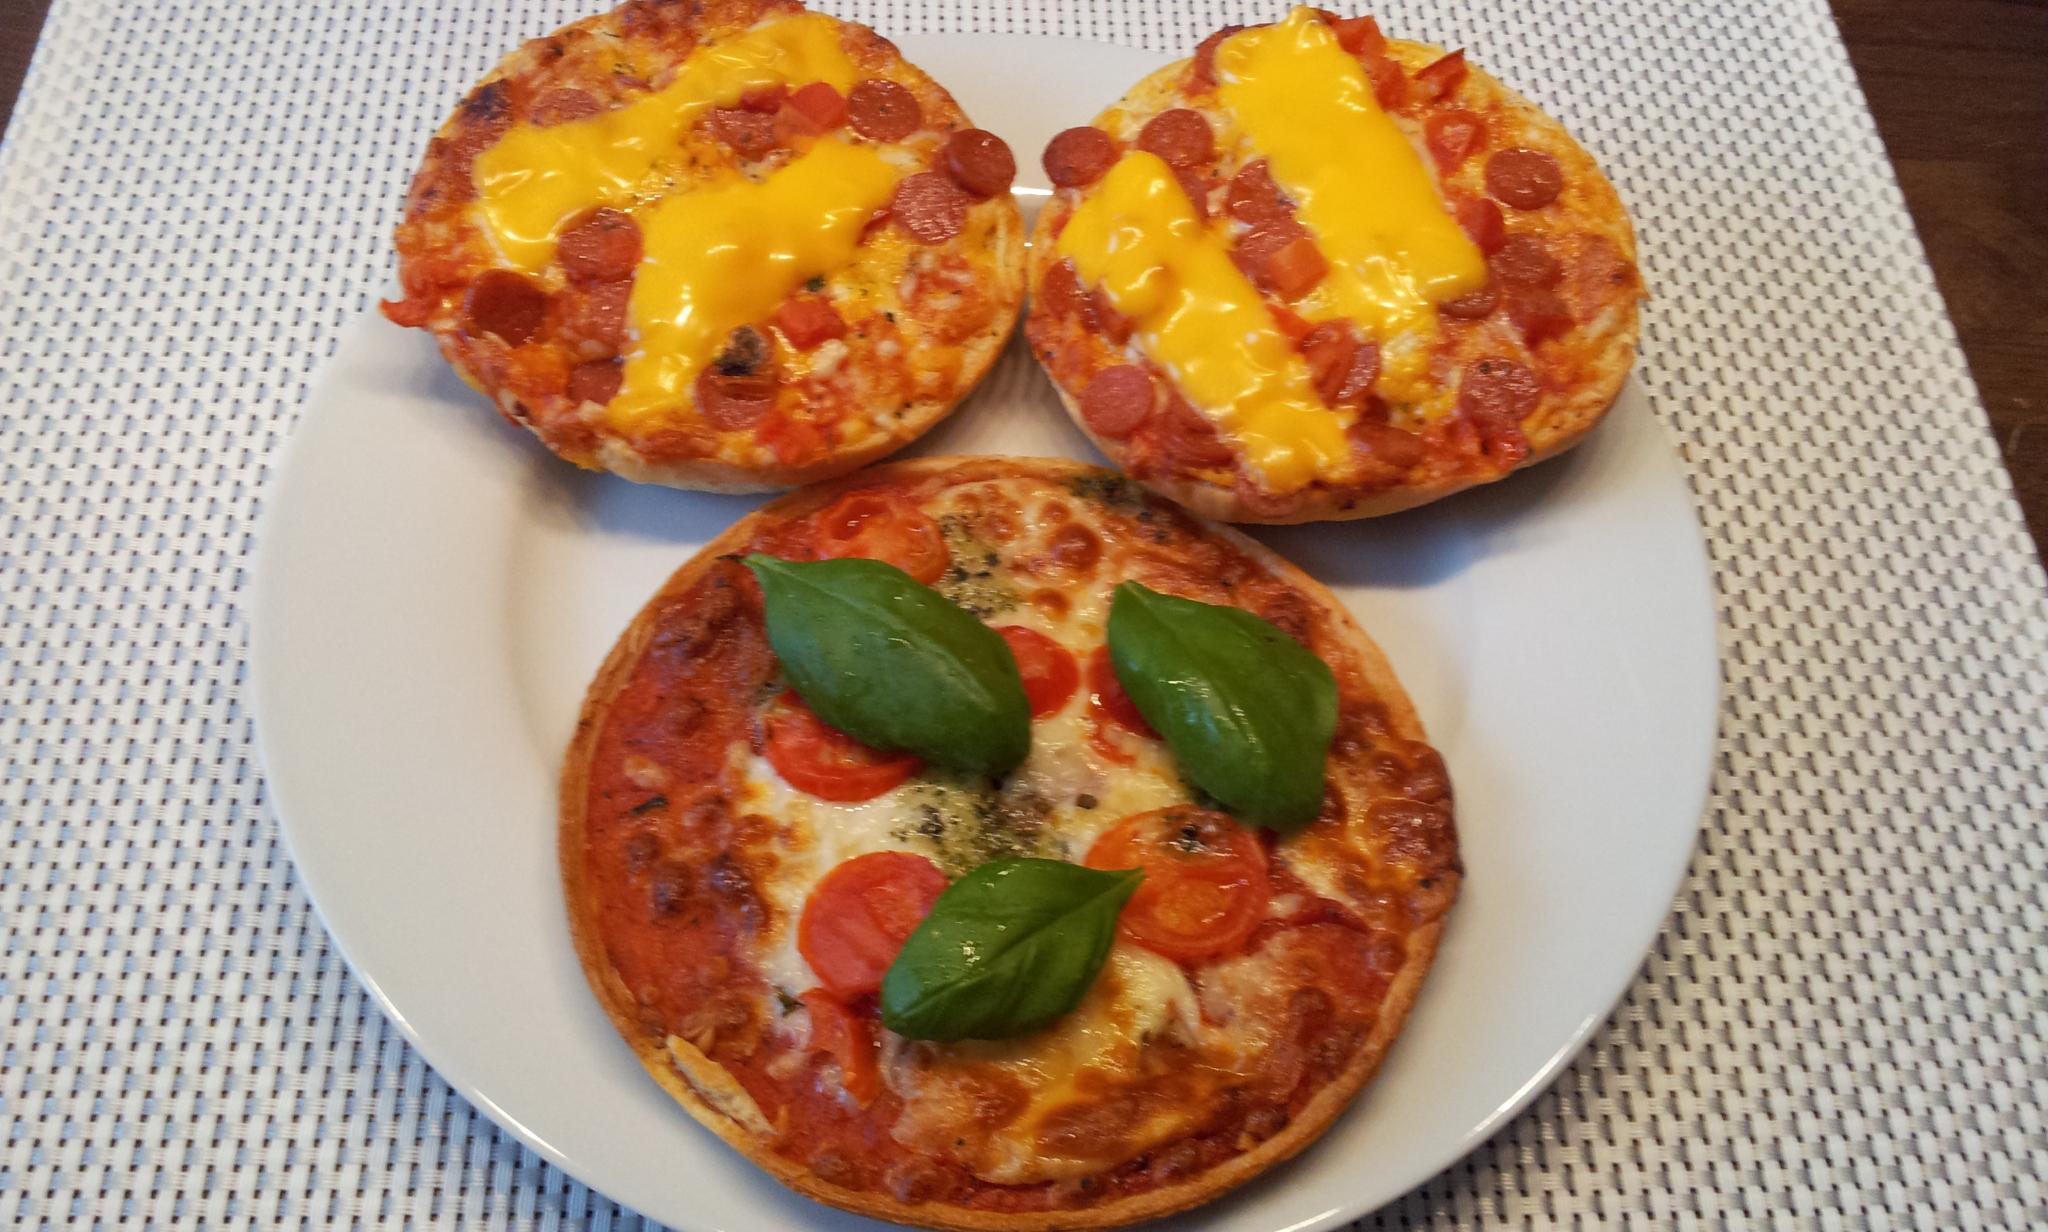 https://foodloader.net/Holz_2014-05-12_Pizzaburger_und_Pizza.jpg